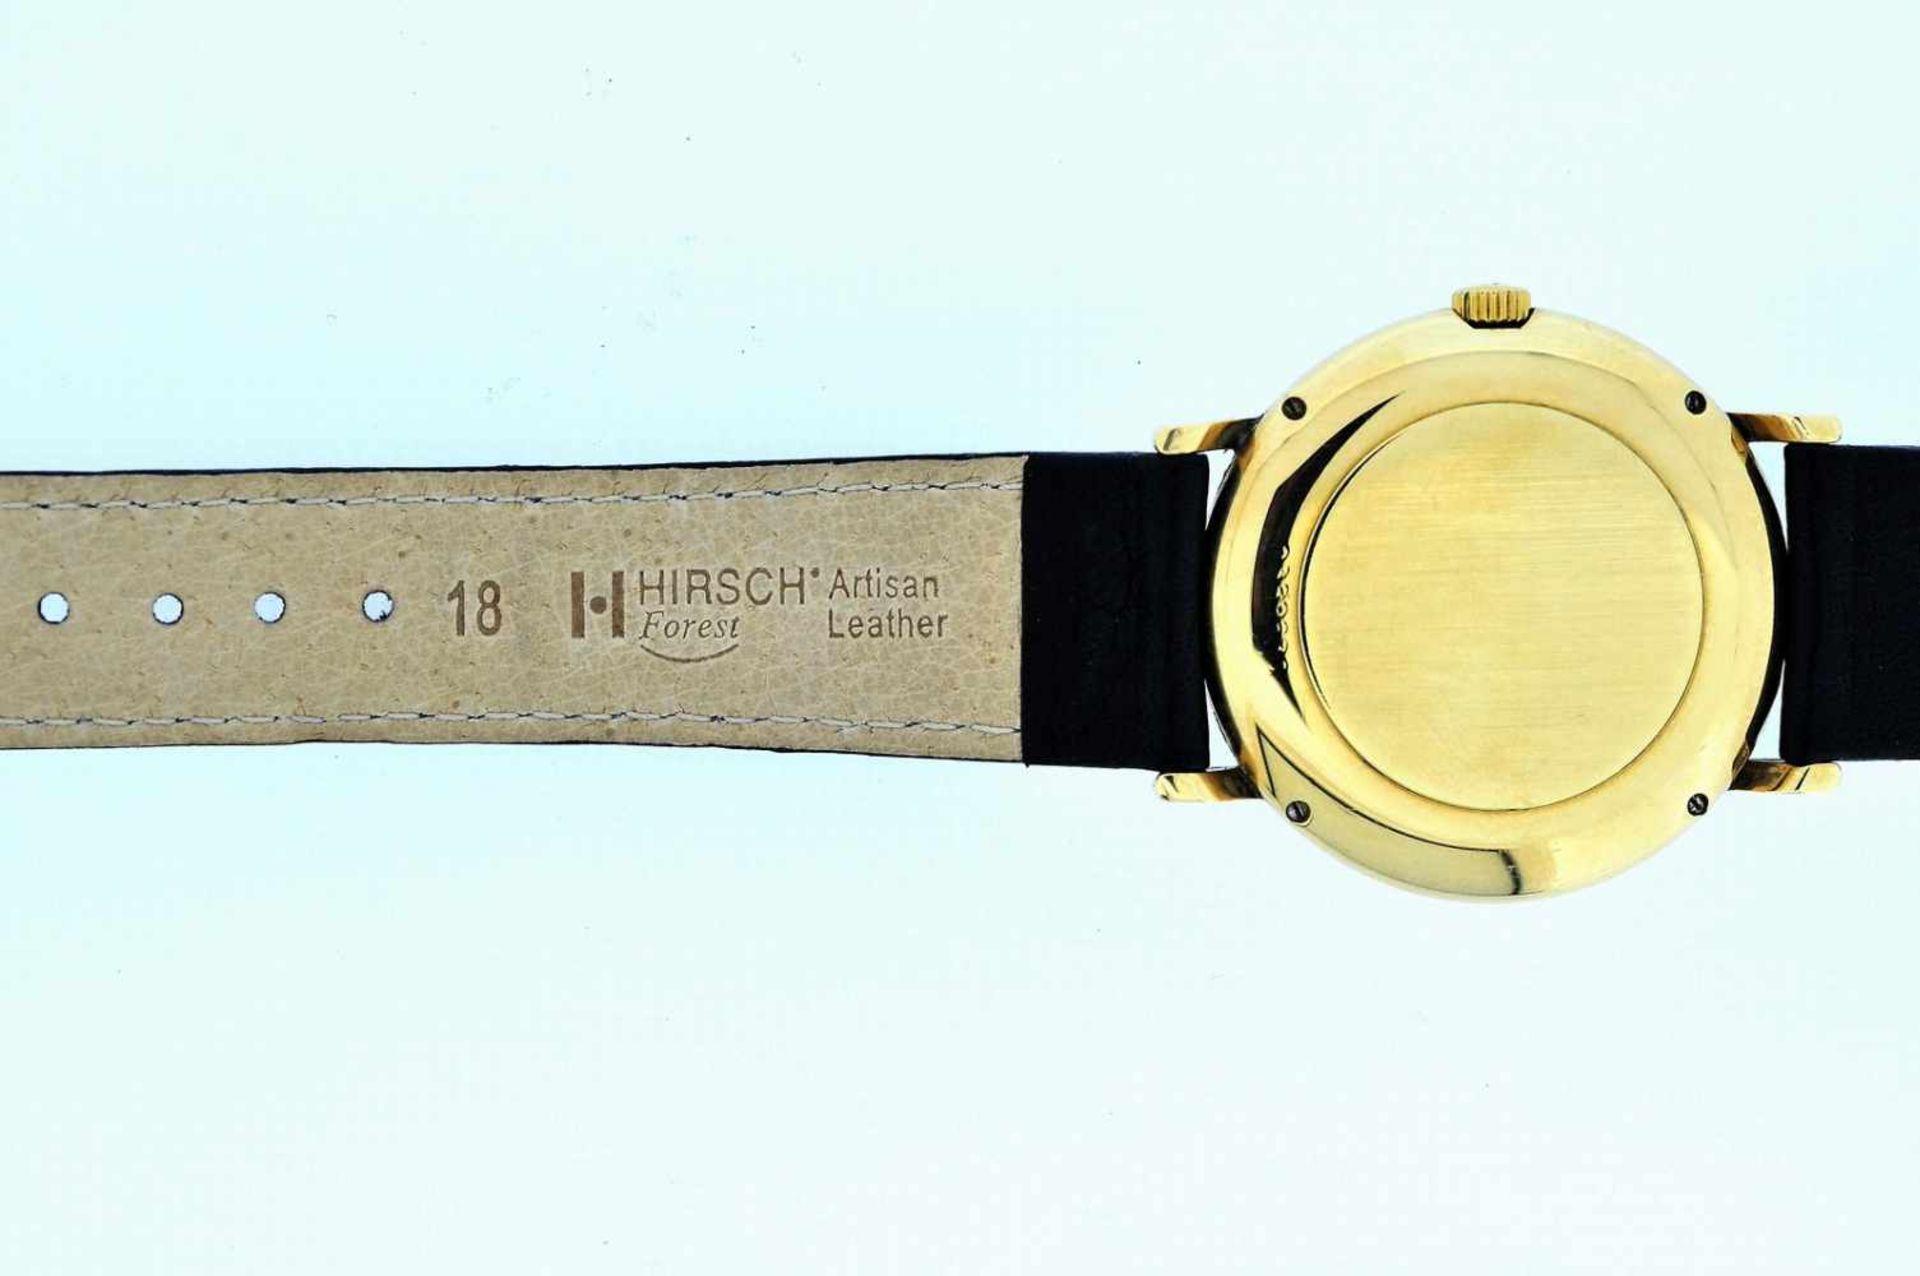 IWC Goldene 18karätige Armbanduhr an Lederband, IWC, Automatik, zentrale Sekunde, Ankerwerk, - Bild 3 aus 4